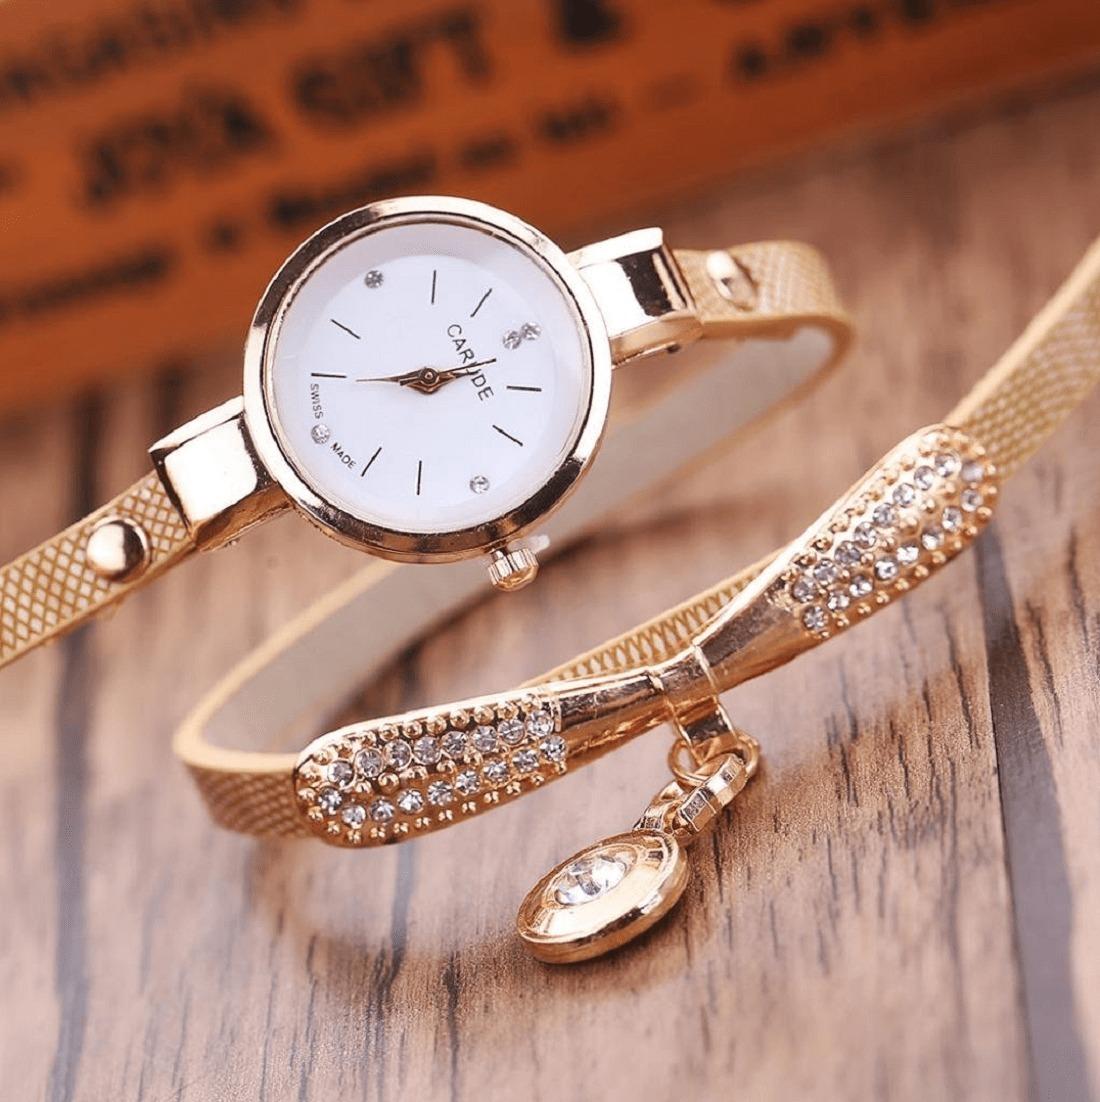 8121b1dab5da reloj casual moda mujer dama brazalete pulsera cristales. Cargando zoom.